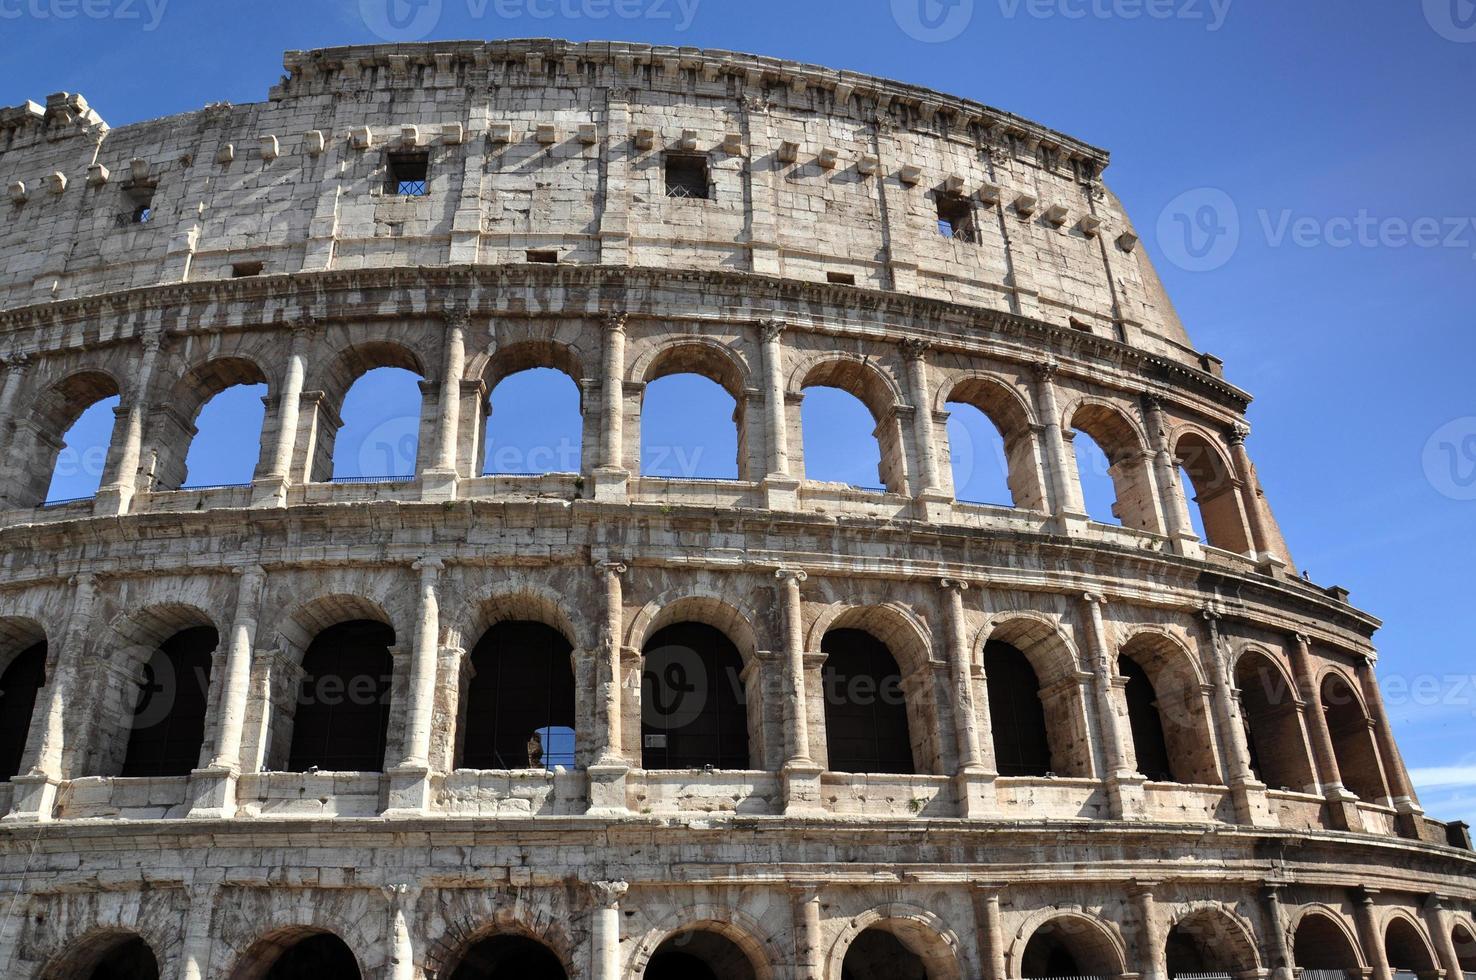 groot colosseum (coliseum), foto